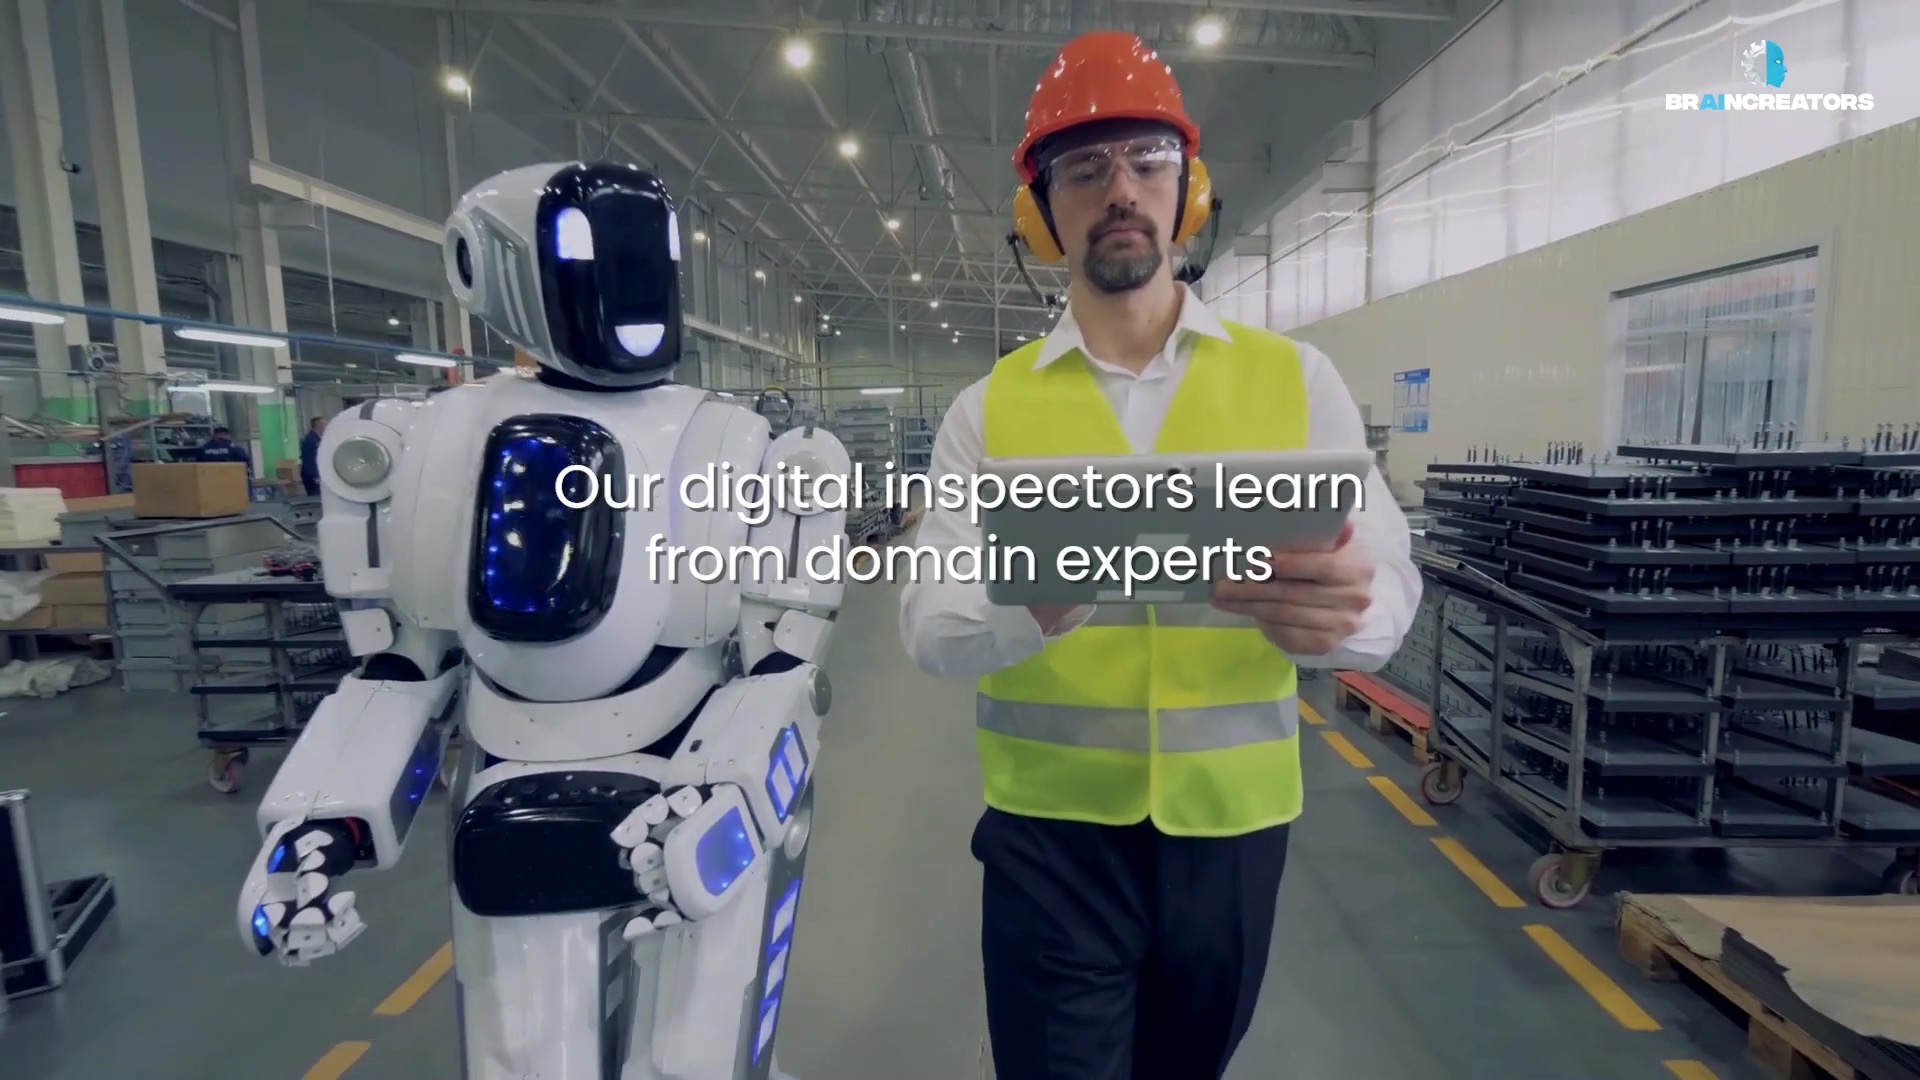 BrainCreators Digital Inspectors Video - Short Version